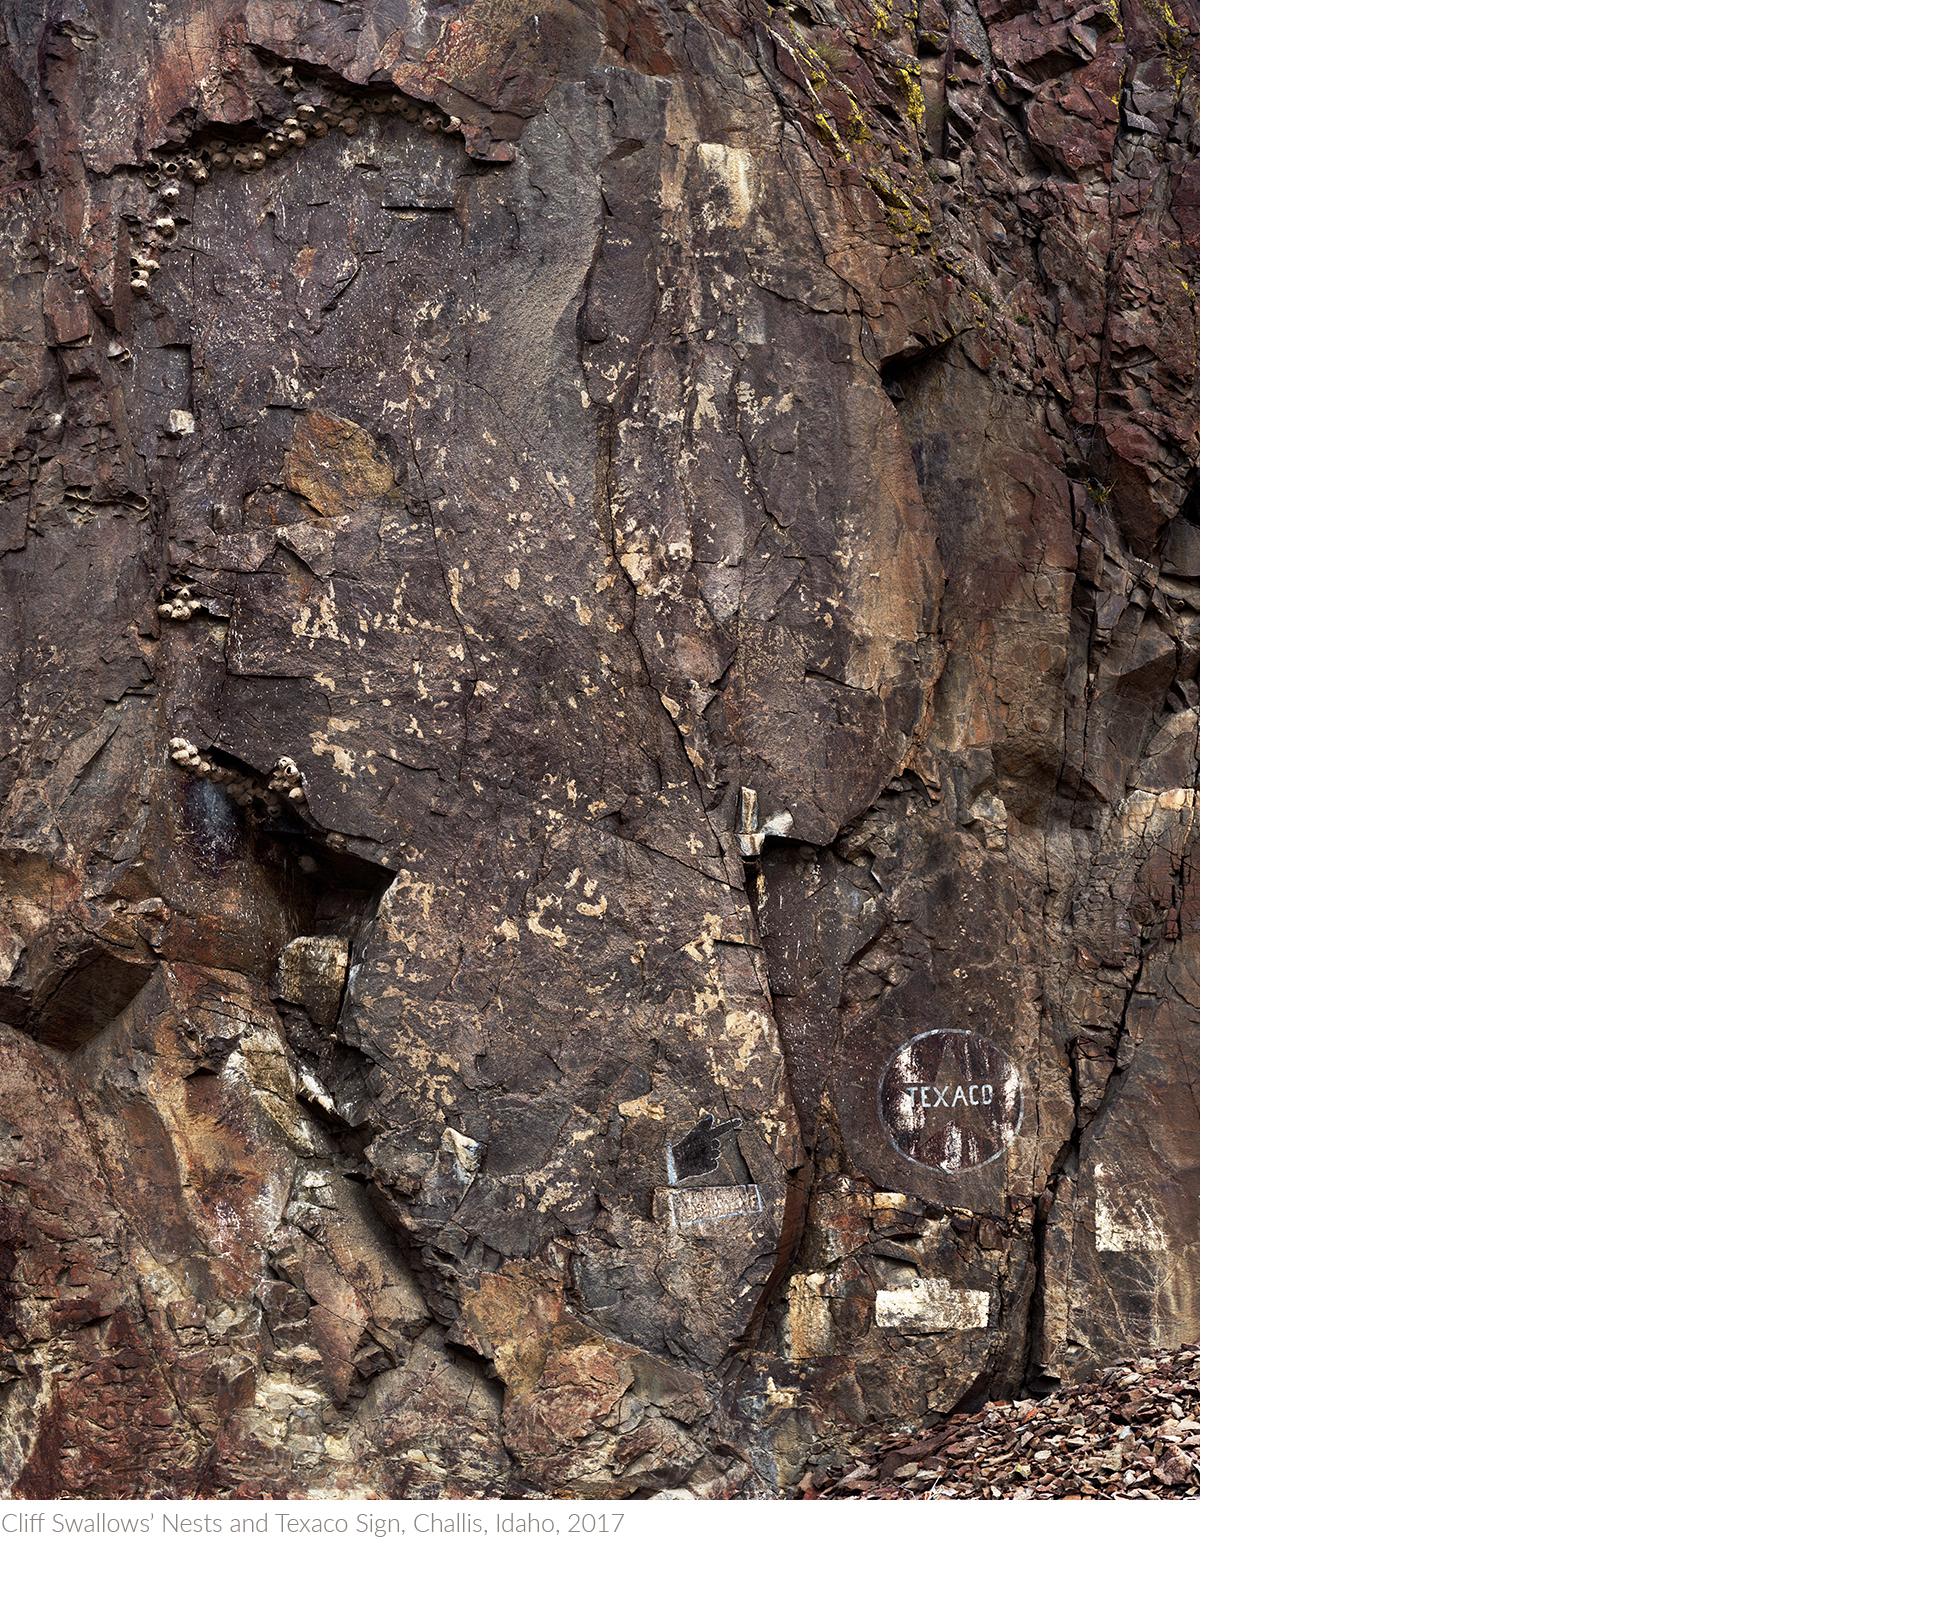 Cliff+Swallows'+Nests+and+Texaco+Sign,+Challis,+Idaho,+2017+copytitledsamesize.jpg